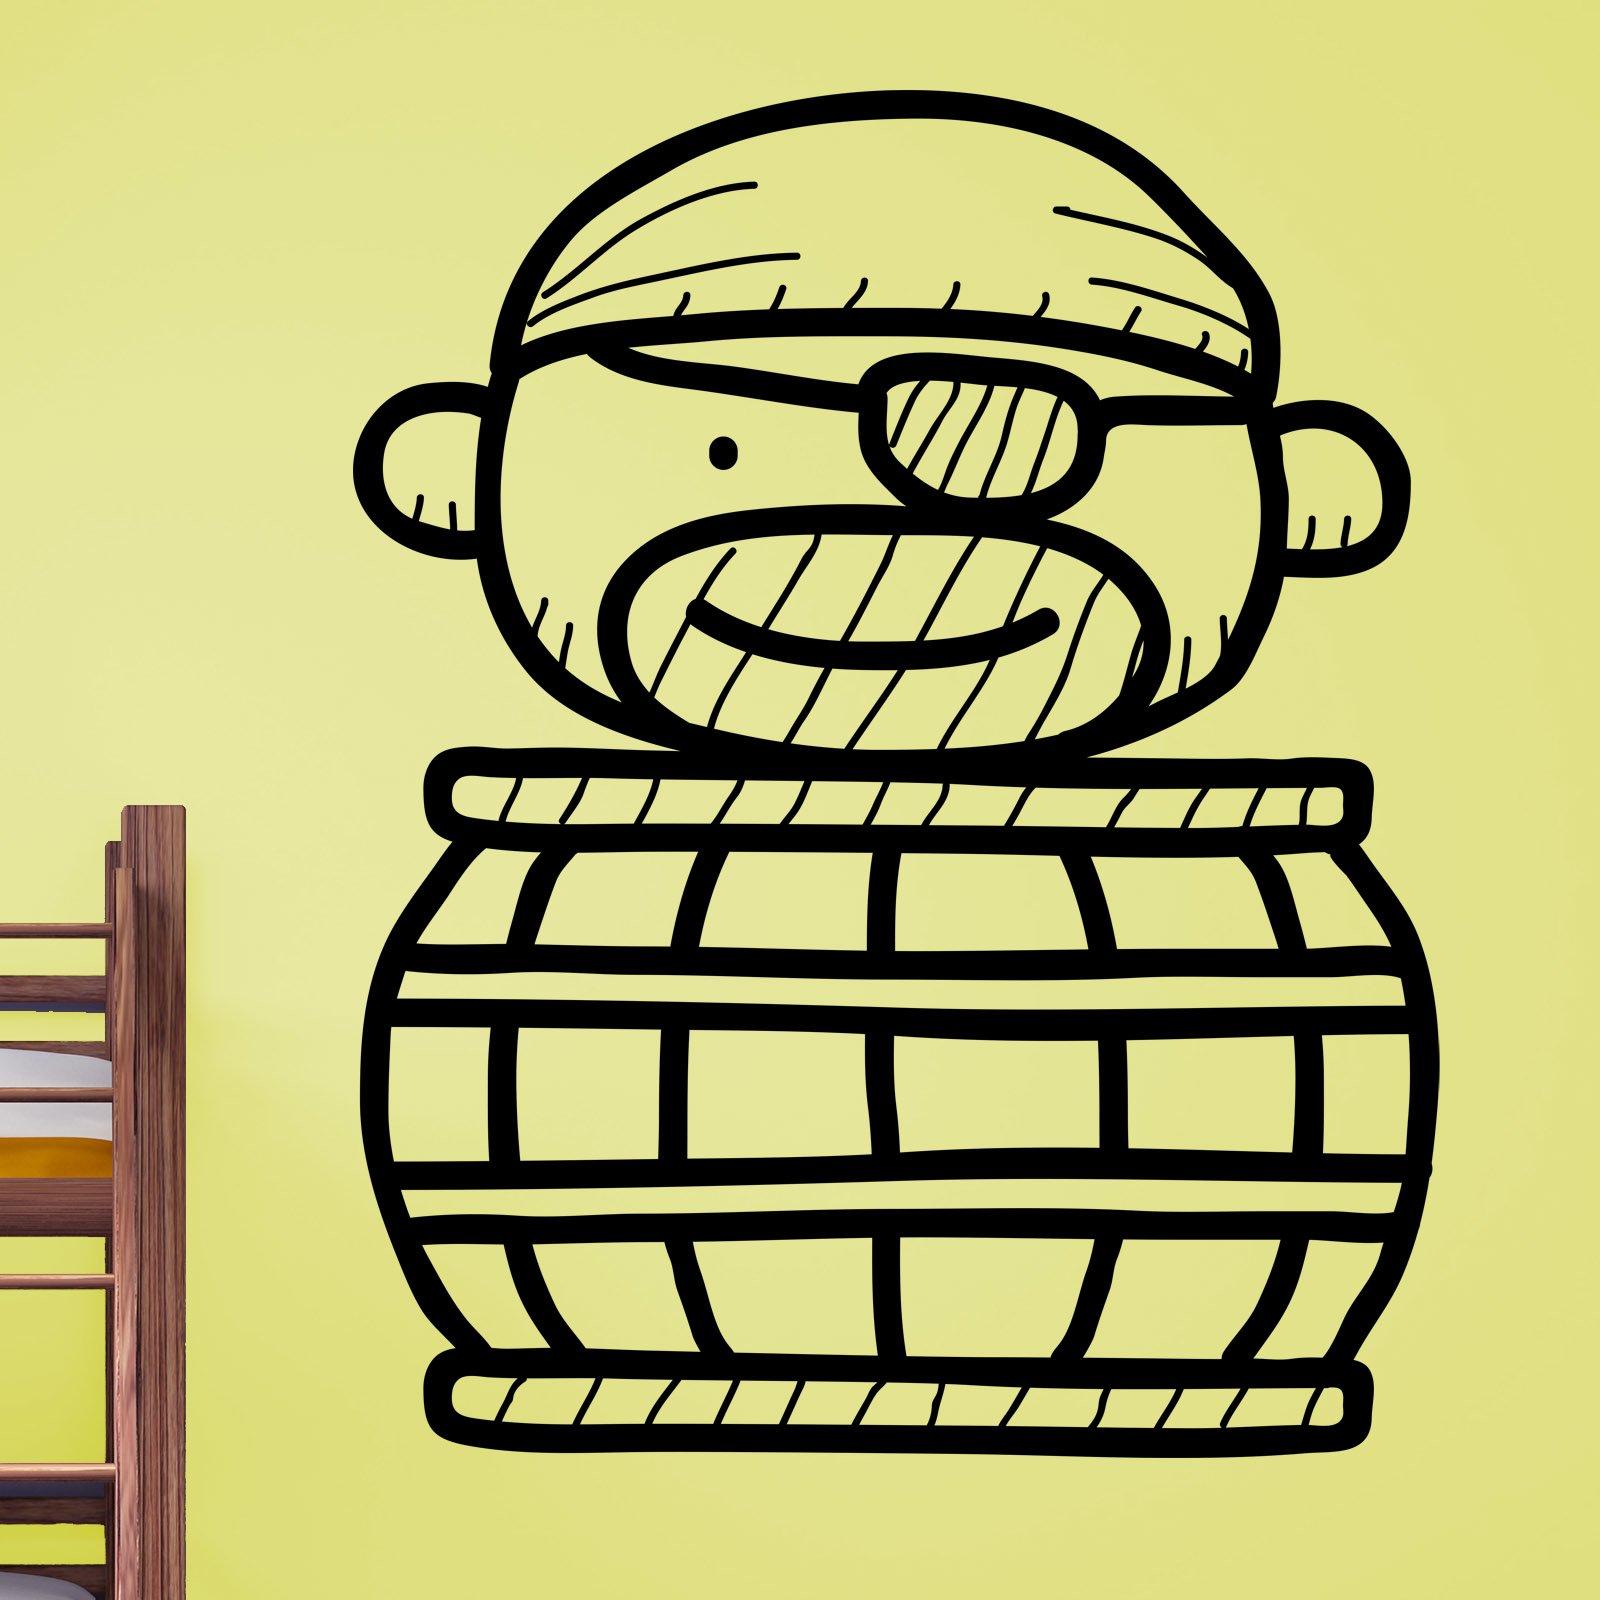 Cartoon Pirate in a Barrel Kids Wall Sticker - World of Wall Stickers